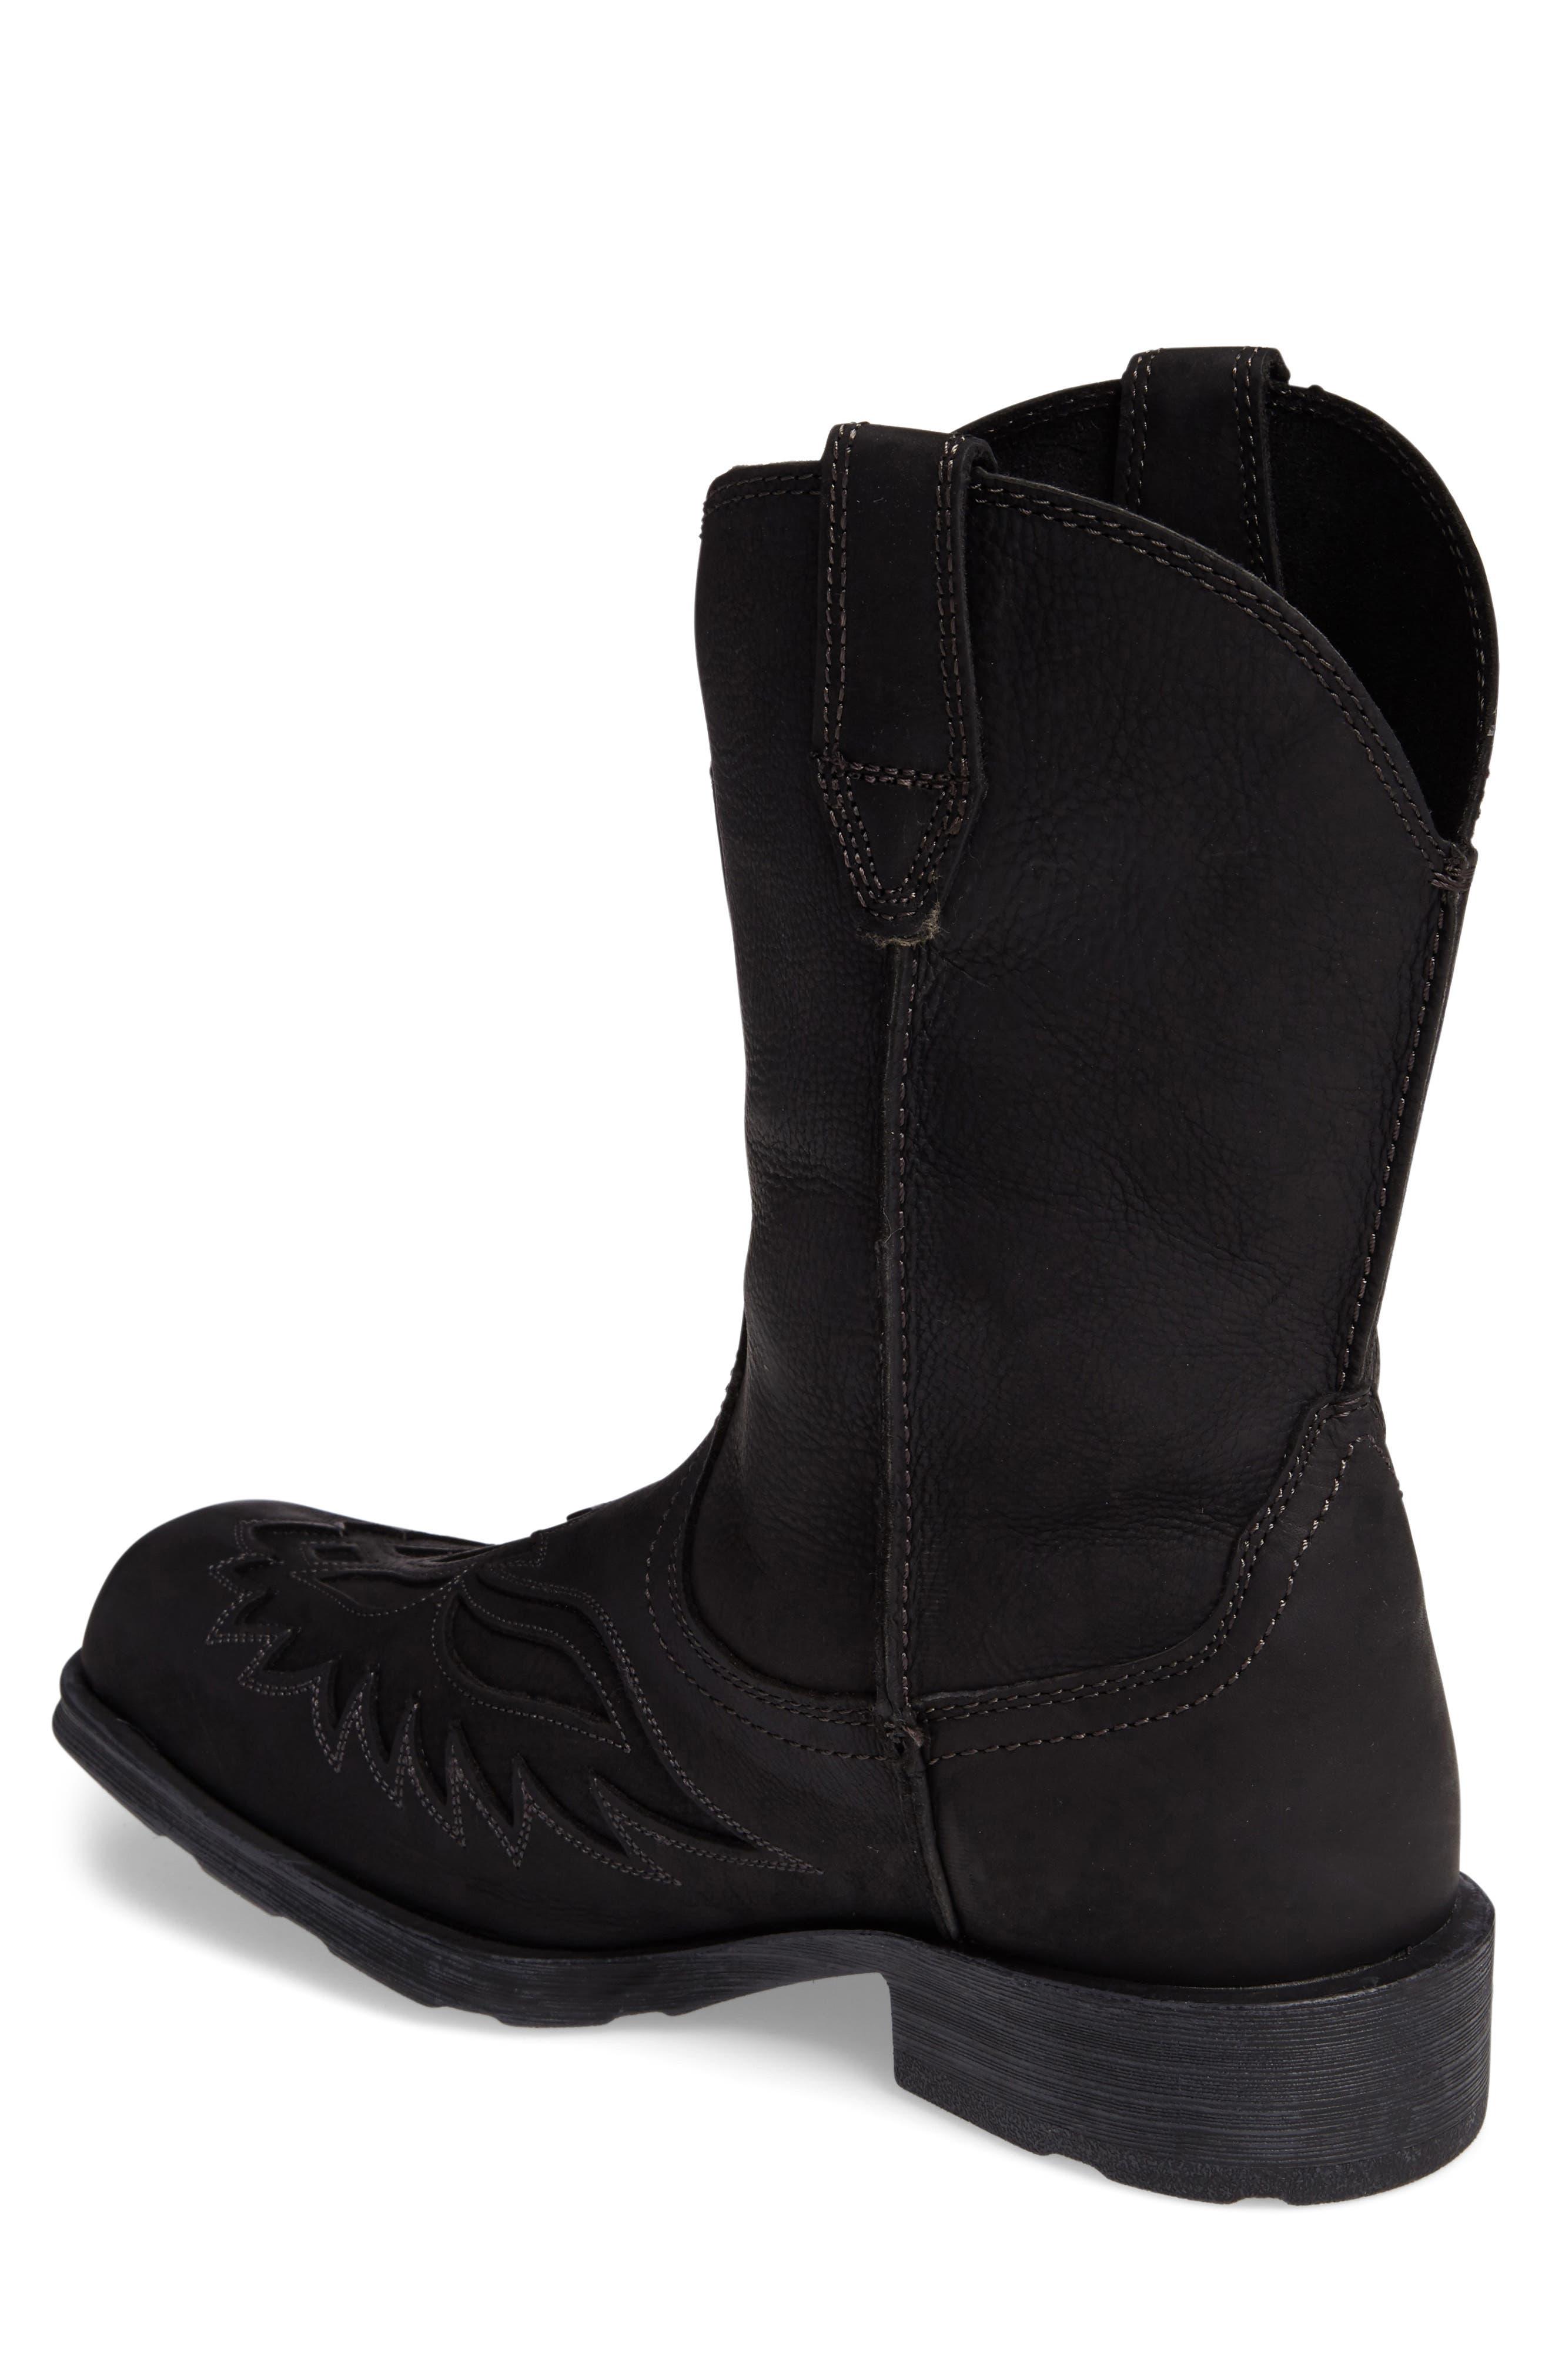 Rambler Renegade Cowboy Boot,                             Alternate thumbnail 2, color,                             BLACK